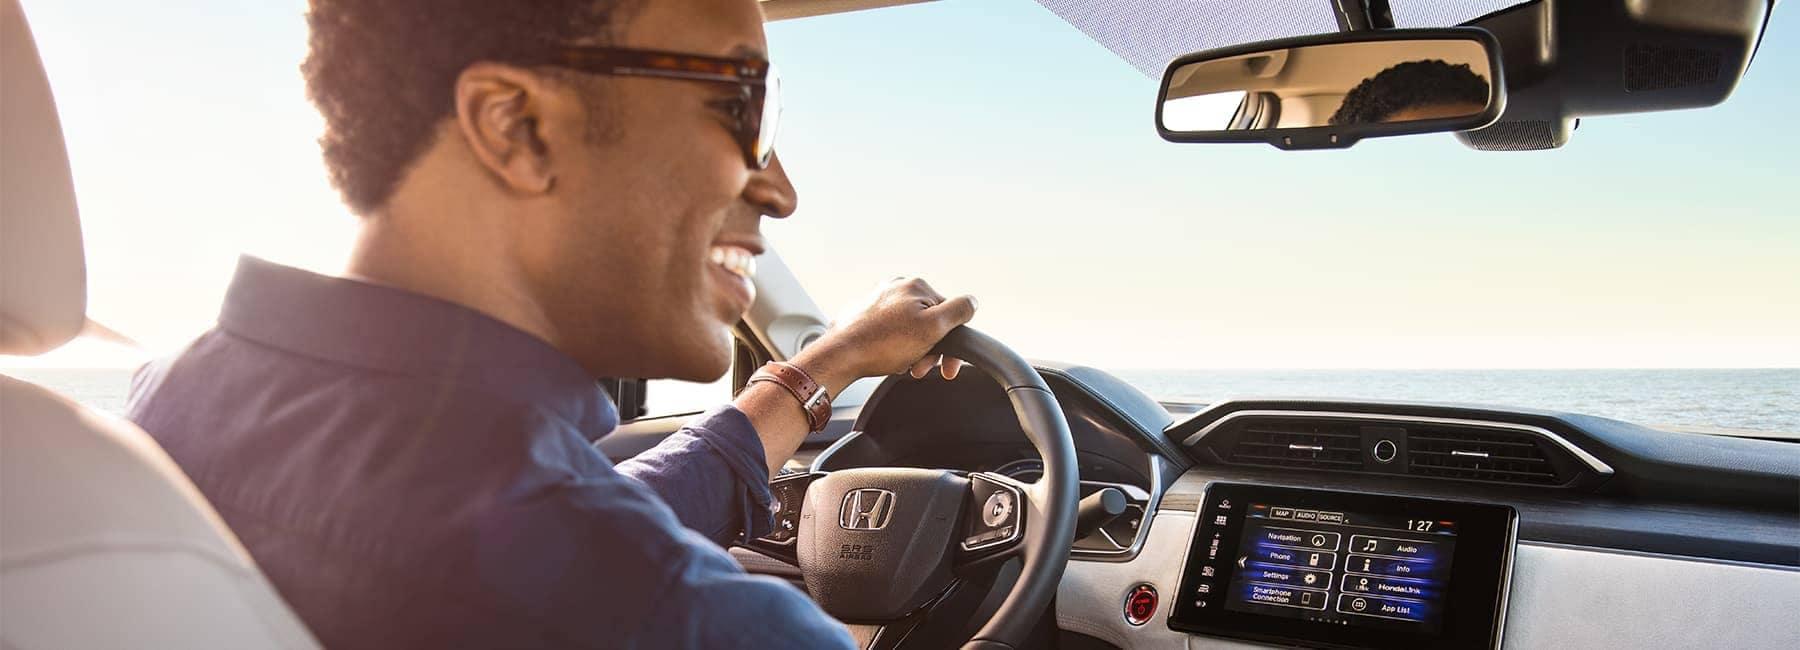 2020-honda-clarity-interior-driver-mobile